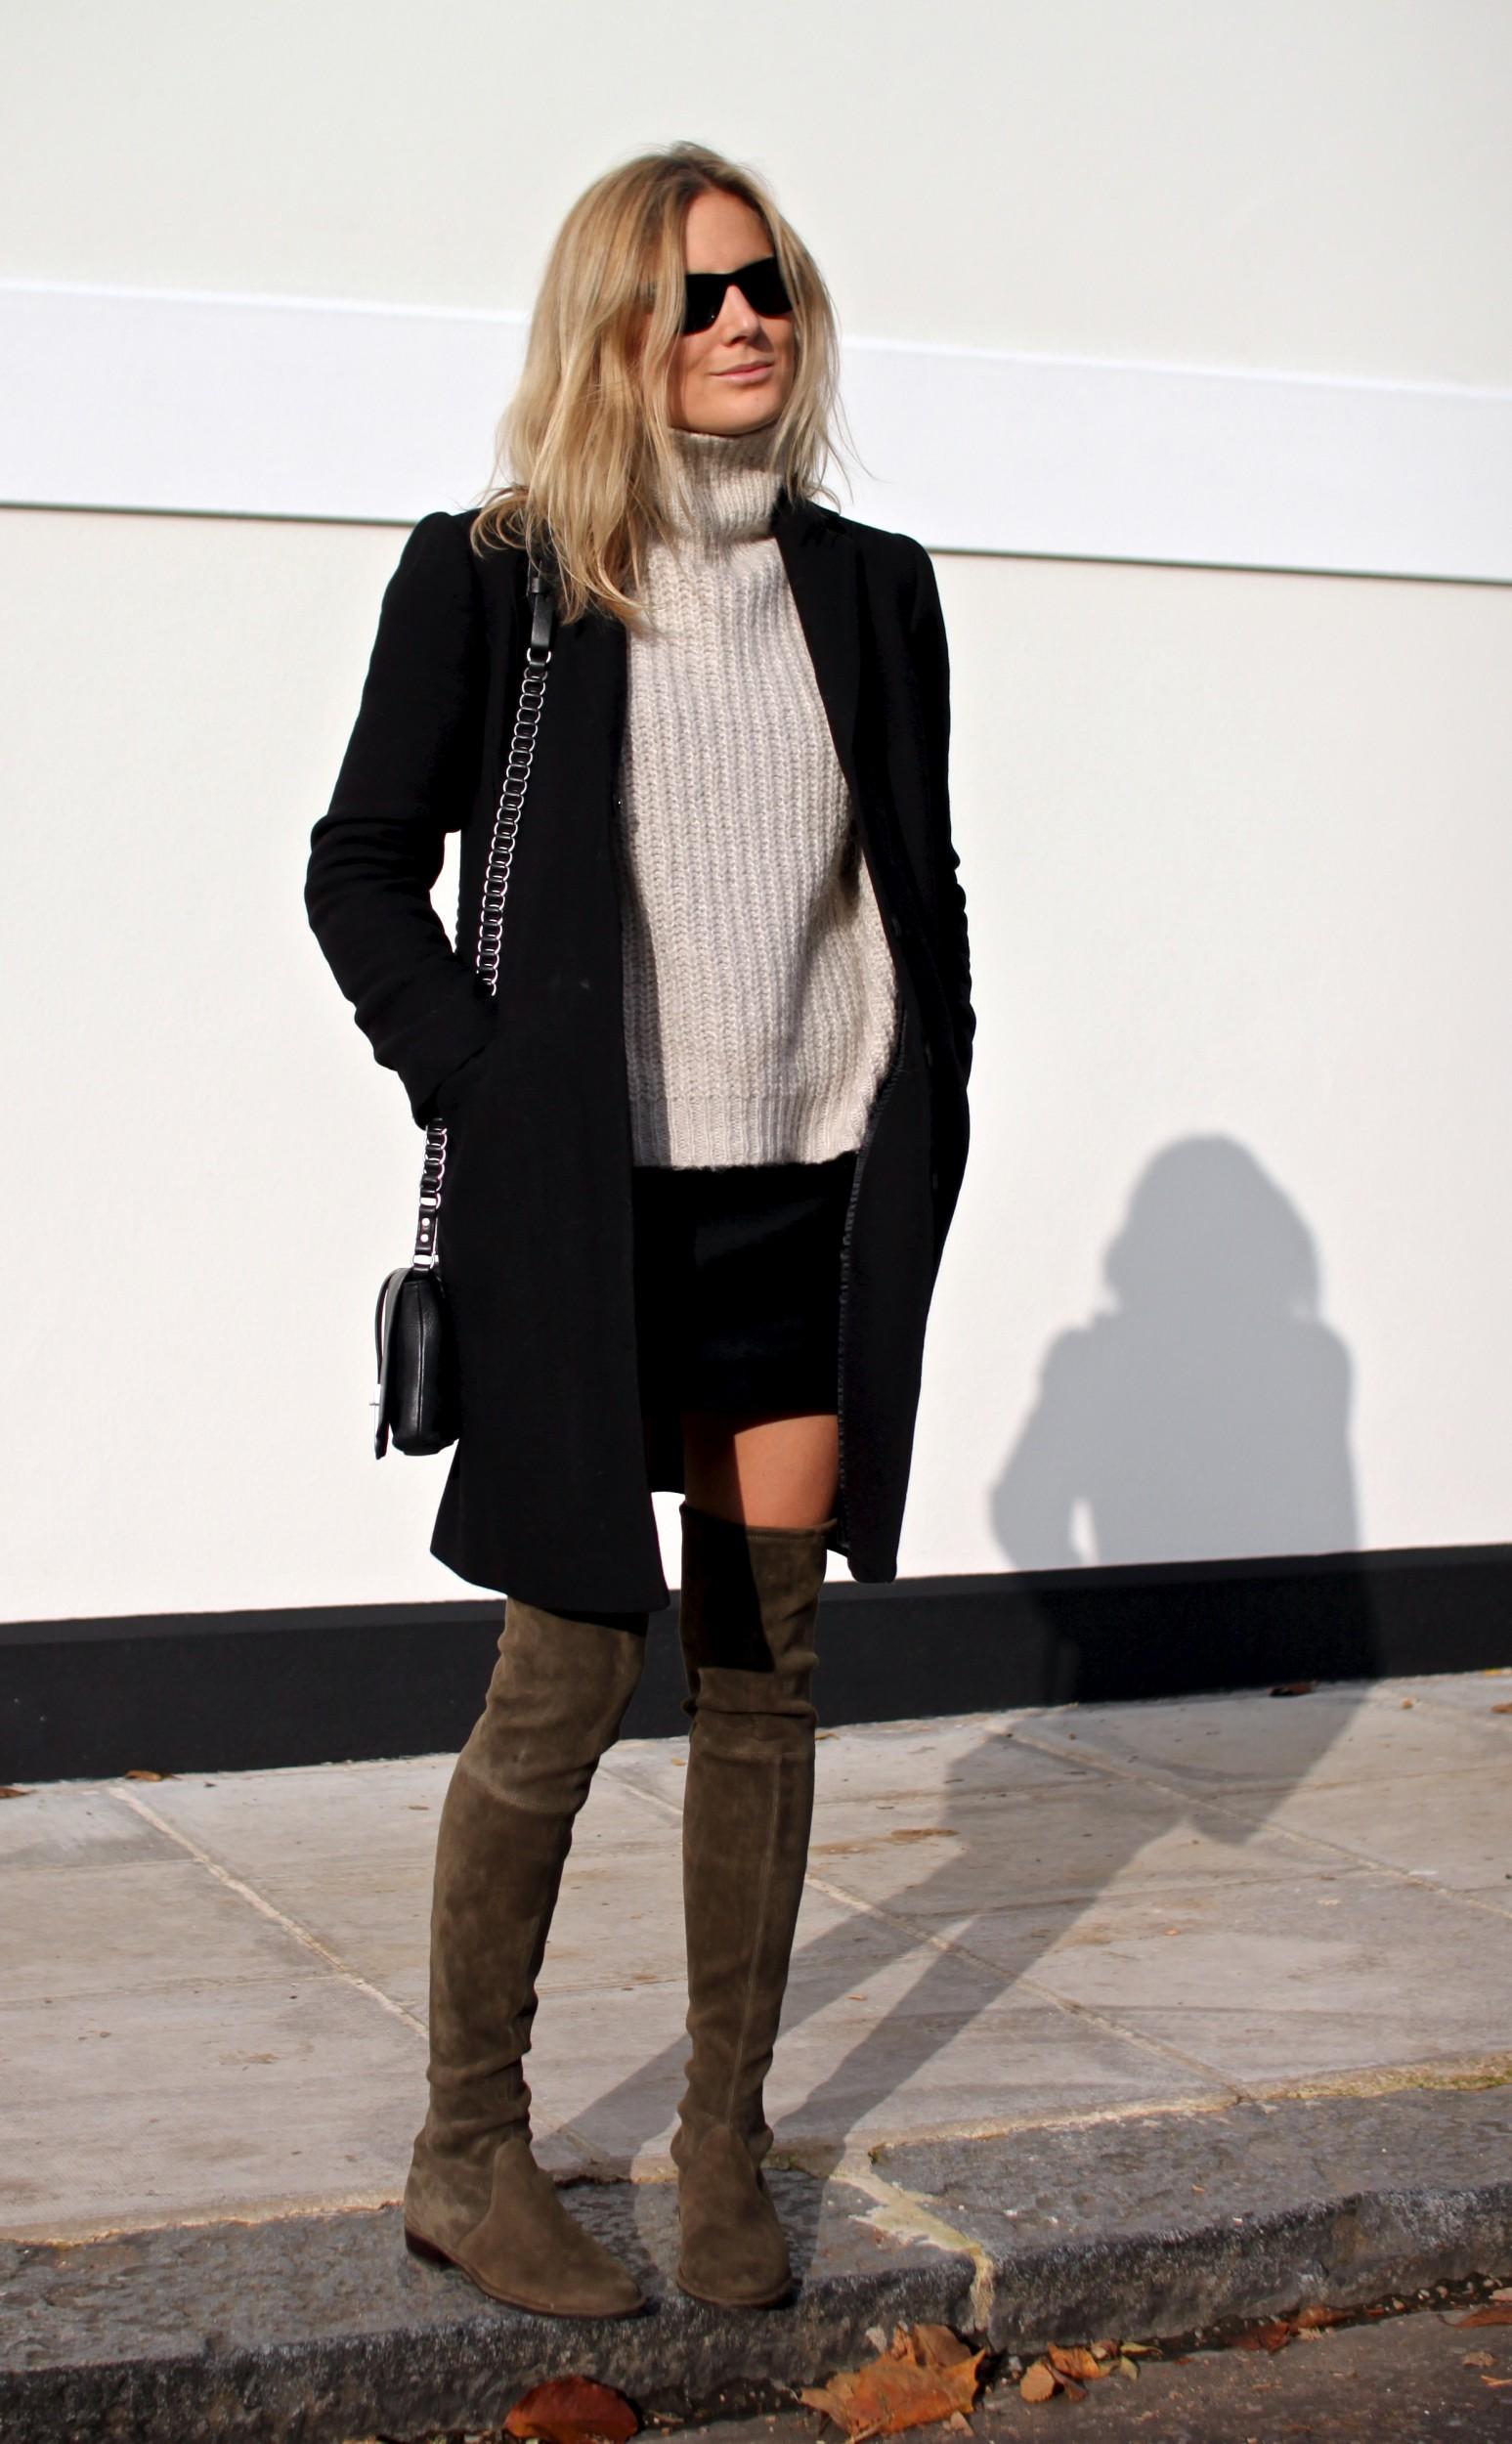 New Jacket Fashion Me Now Bloglovin